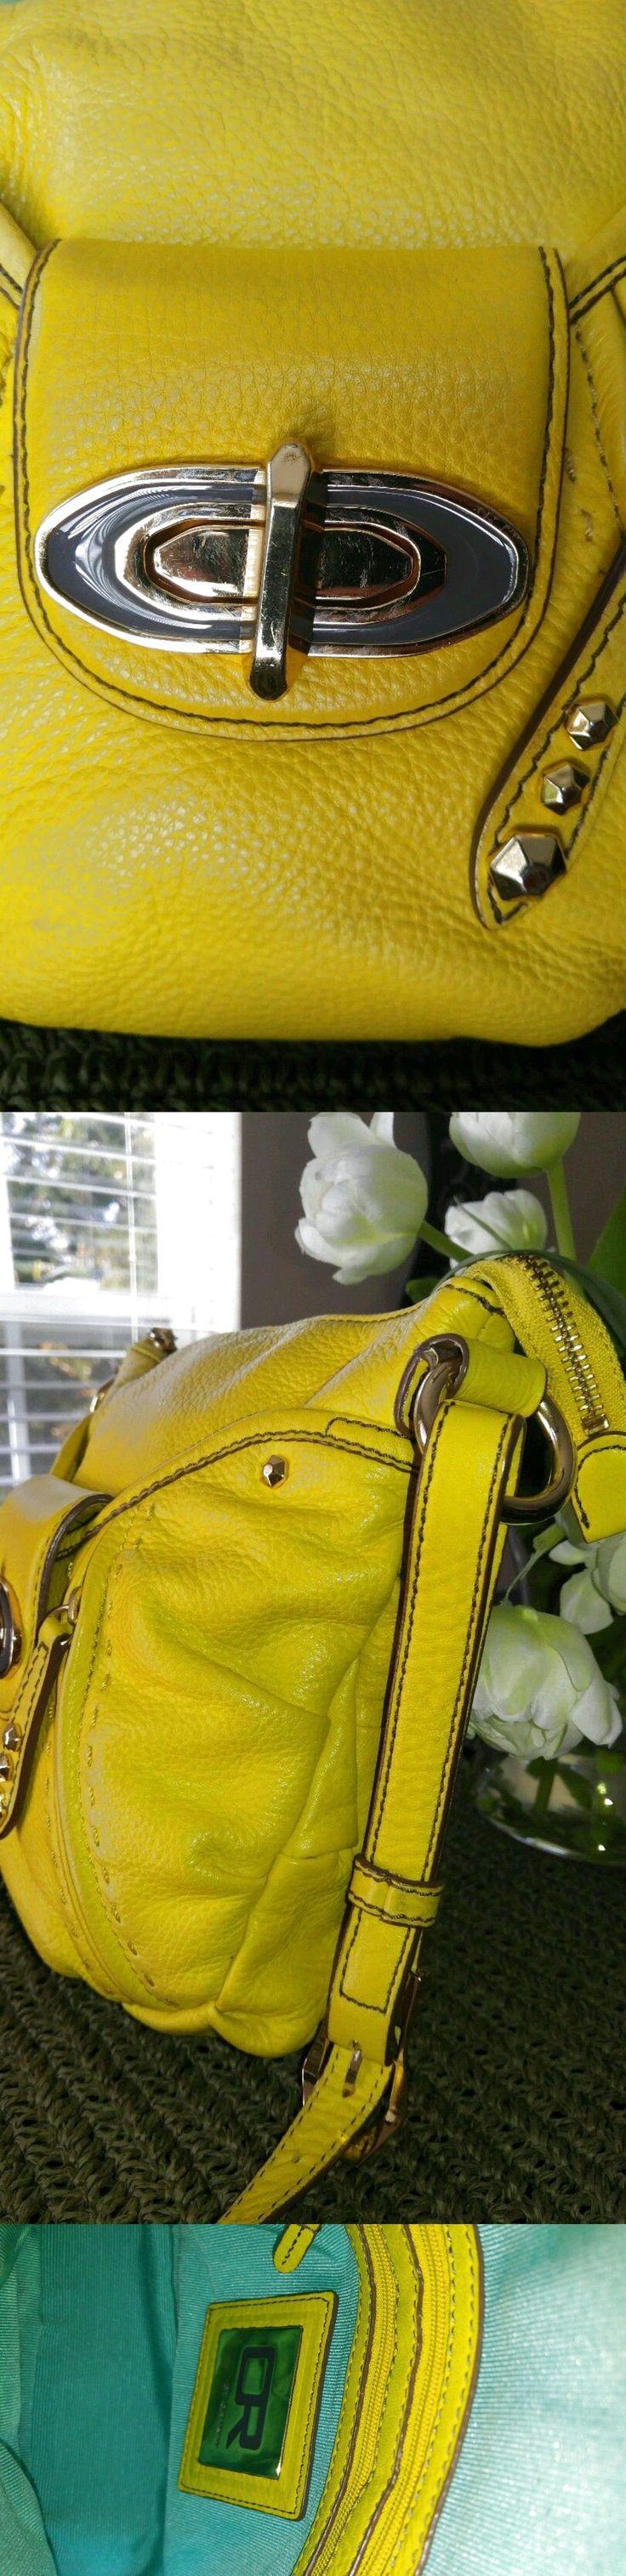 orYANY Small/Med Cross Body Pebbled Leather Handbag $25.0